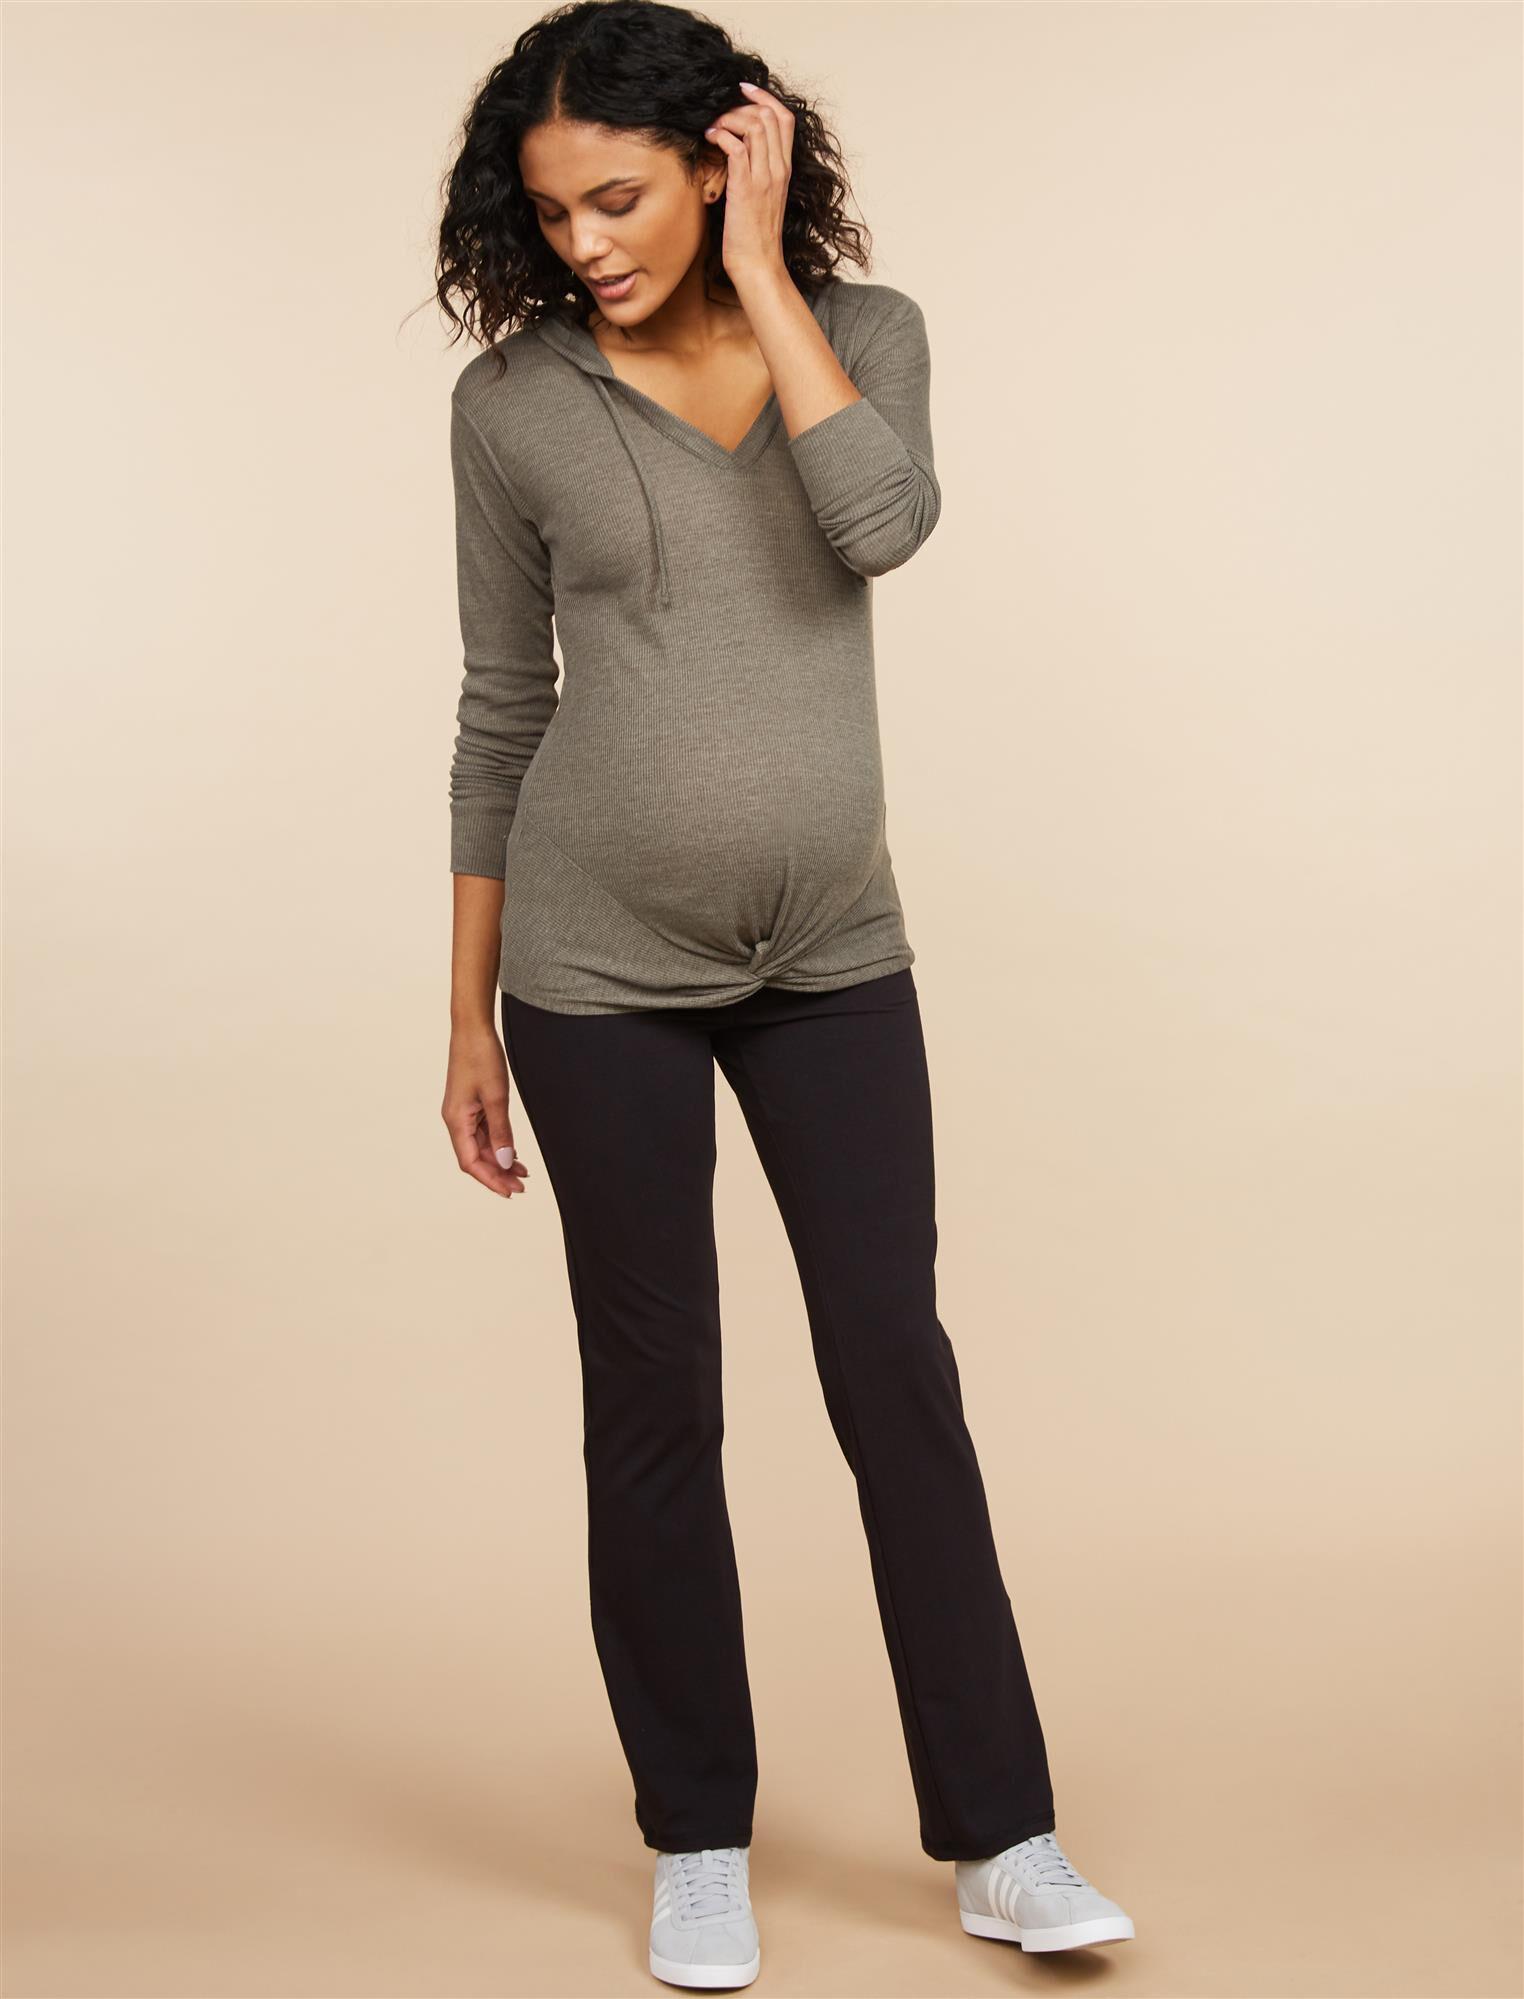 Foldover Belly Boot Cut Maternity Yoga Pants